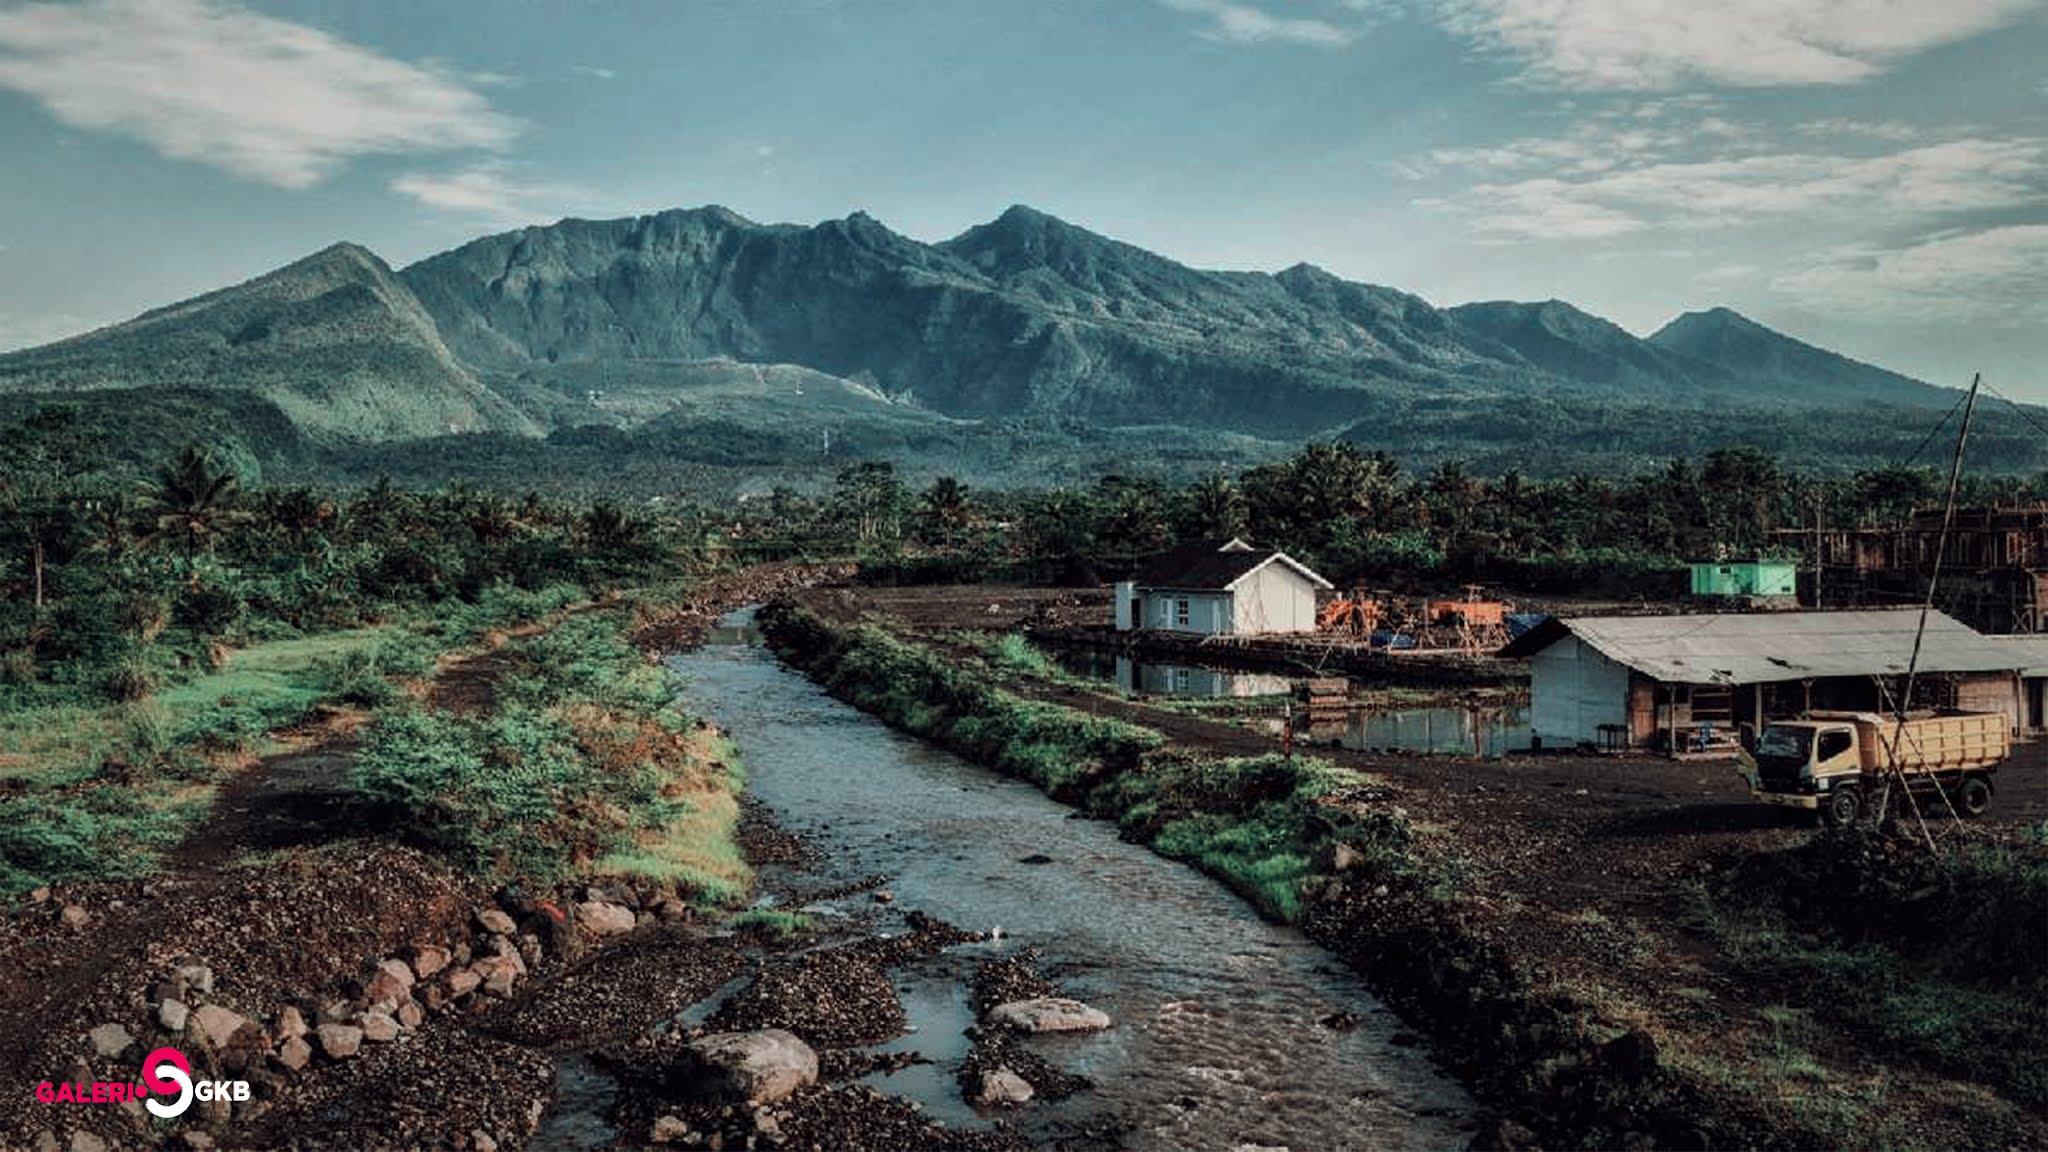 Gunung Galunggung Wallpaper Gambar Gunung Galunggung Tasikmalaya Keren HD